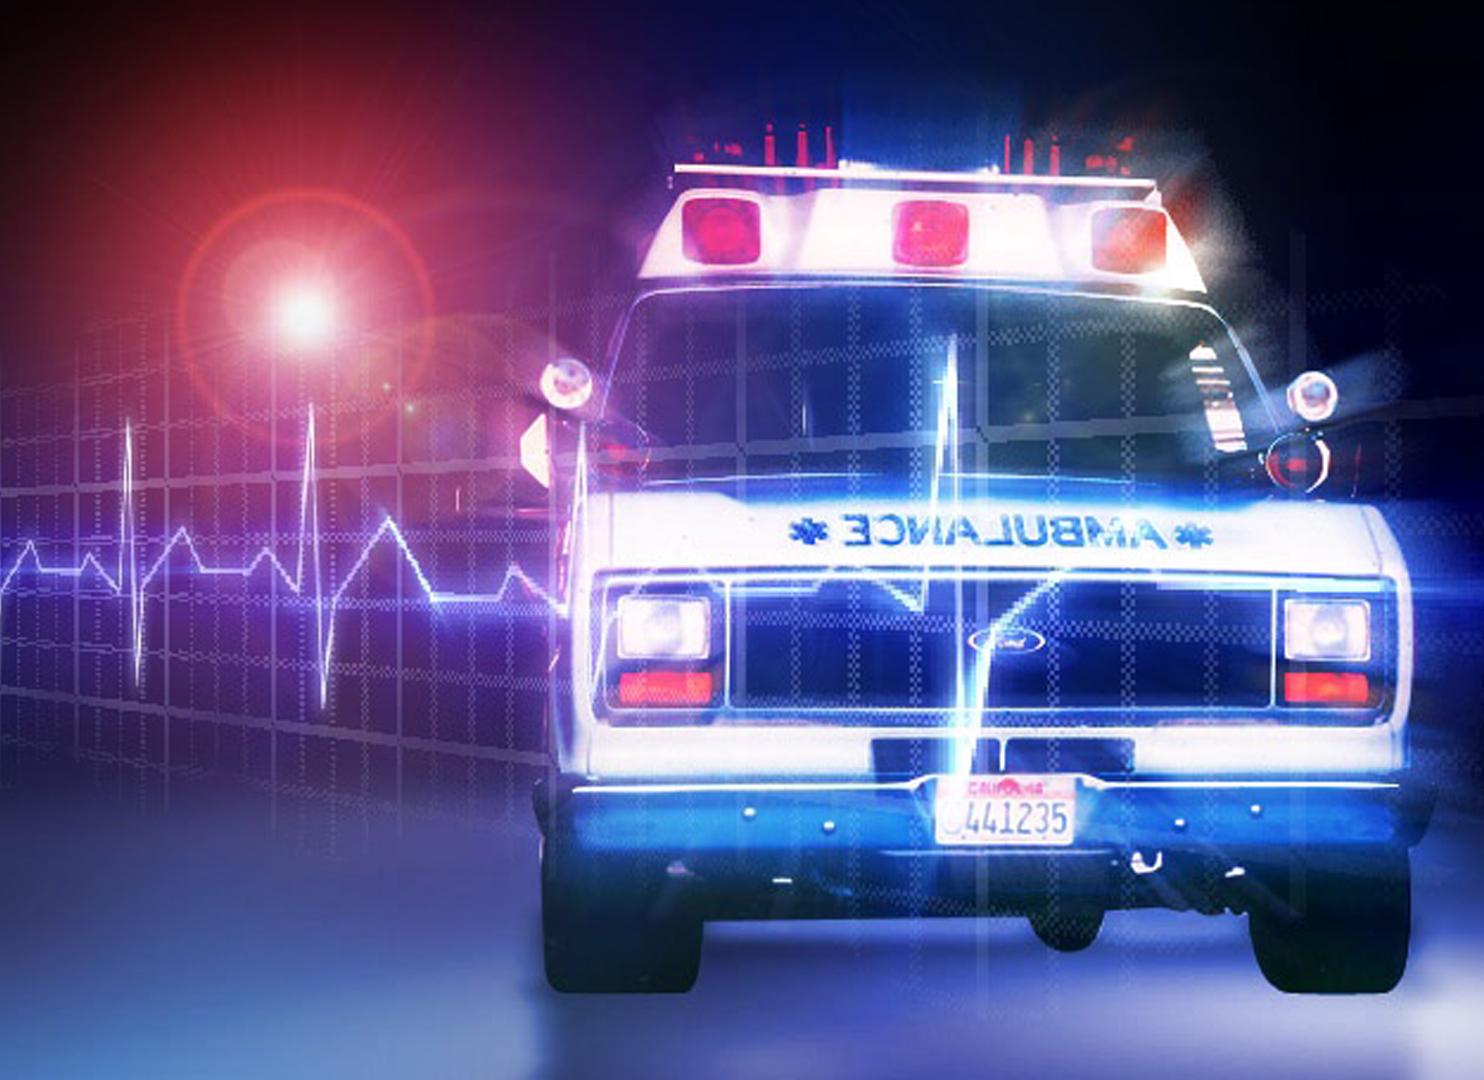 ambulance_1457314937810.jpg